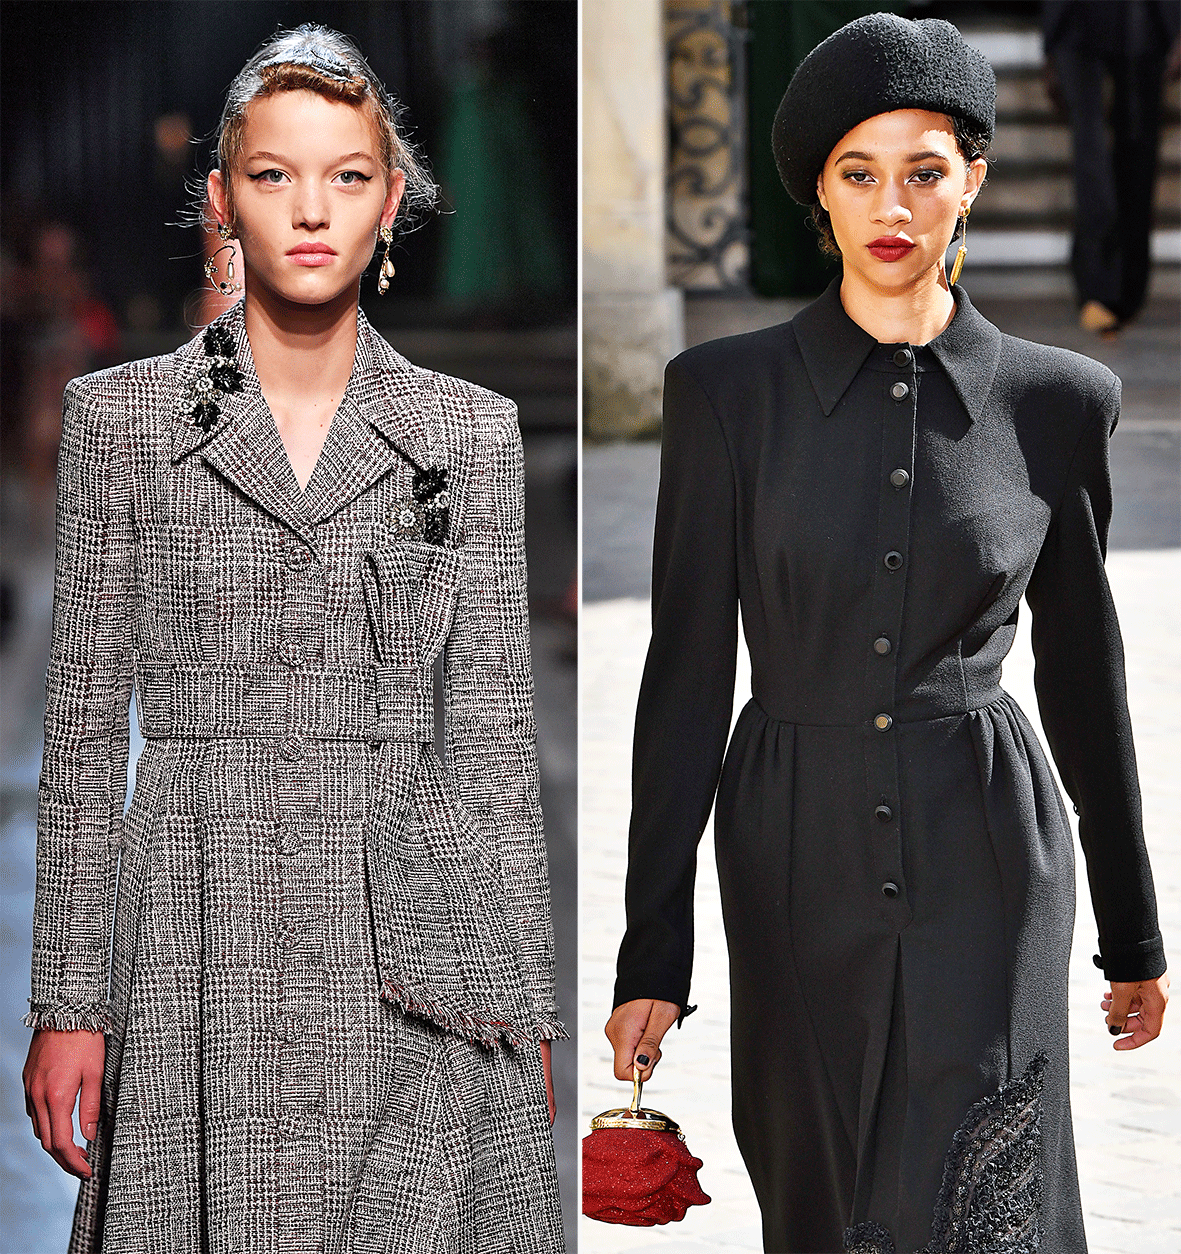 Coat Dresses in Vintage Style